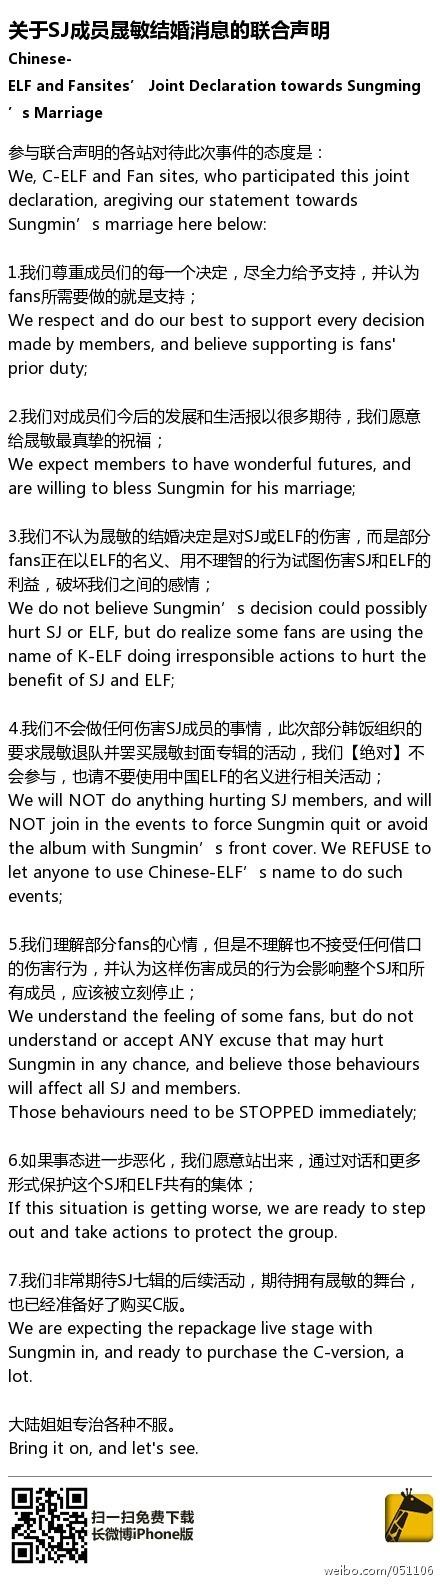 C-ELFs showing support for Super Junior Sungmin's wedding